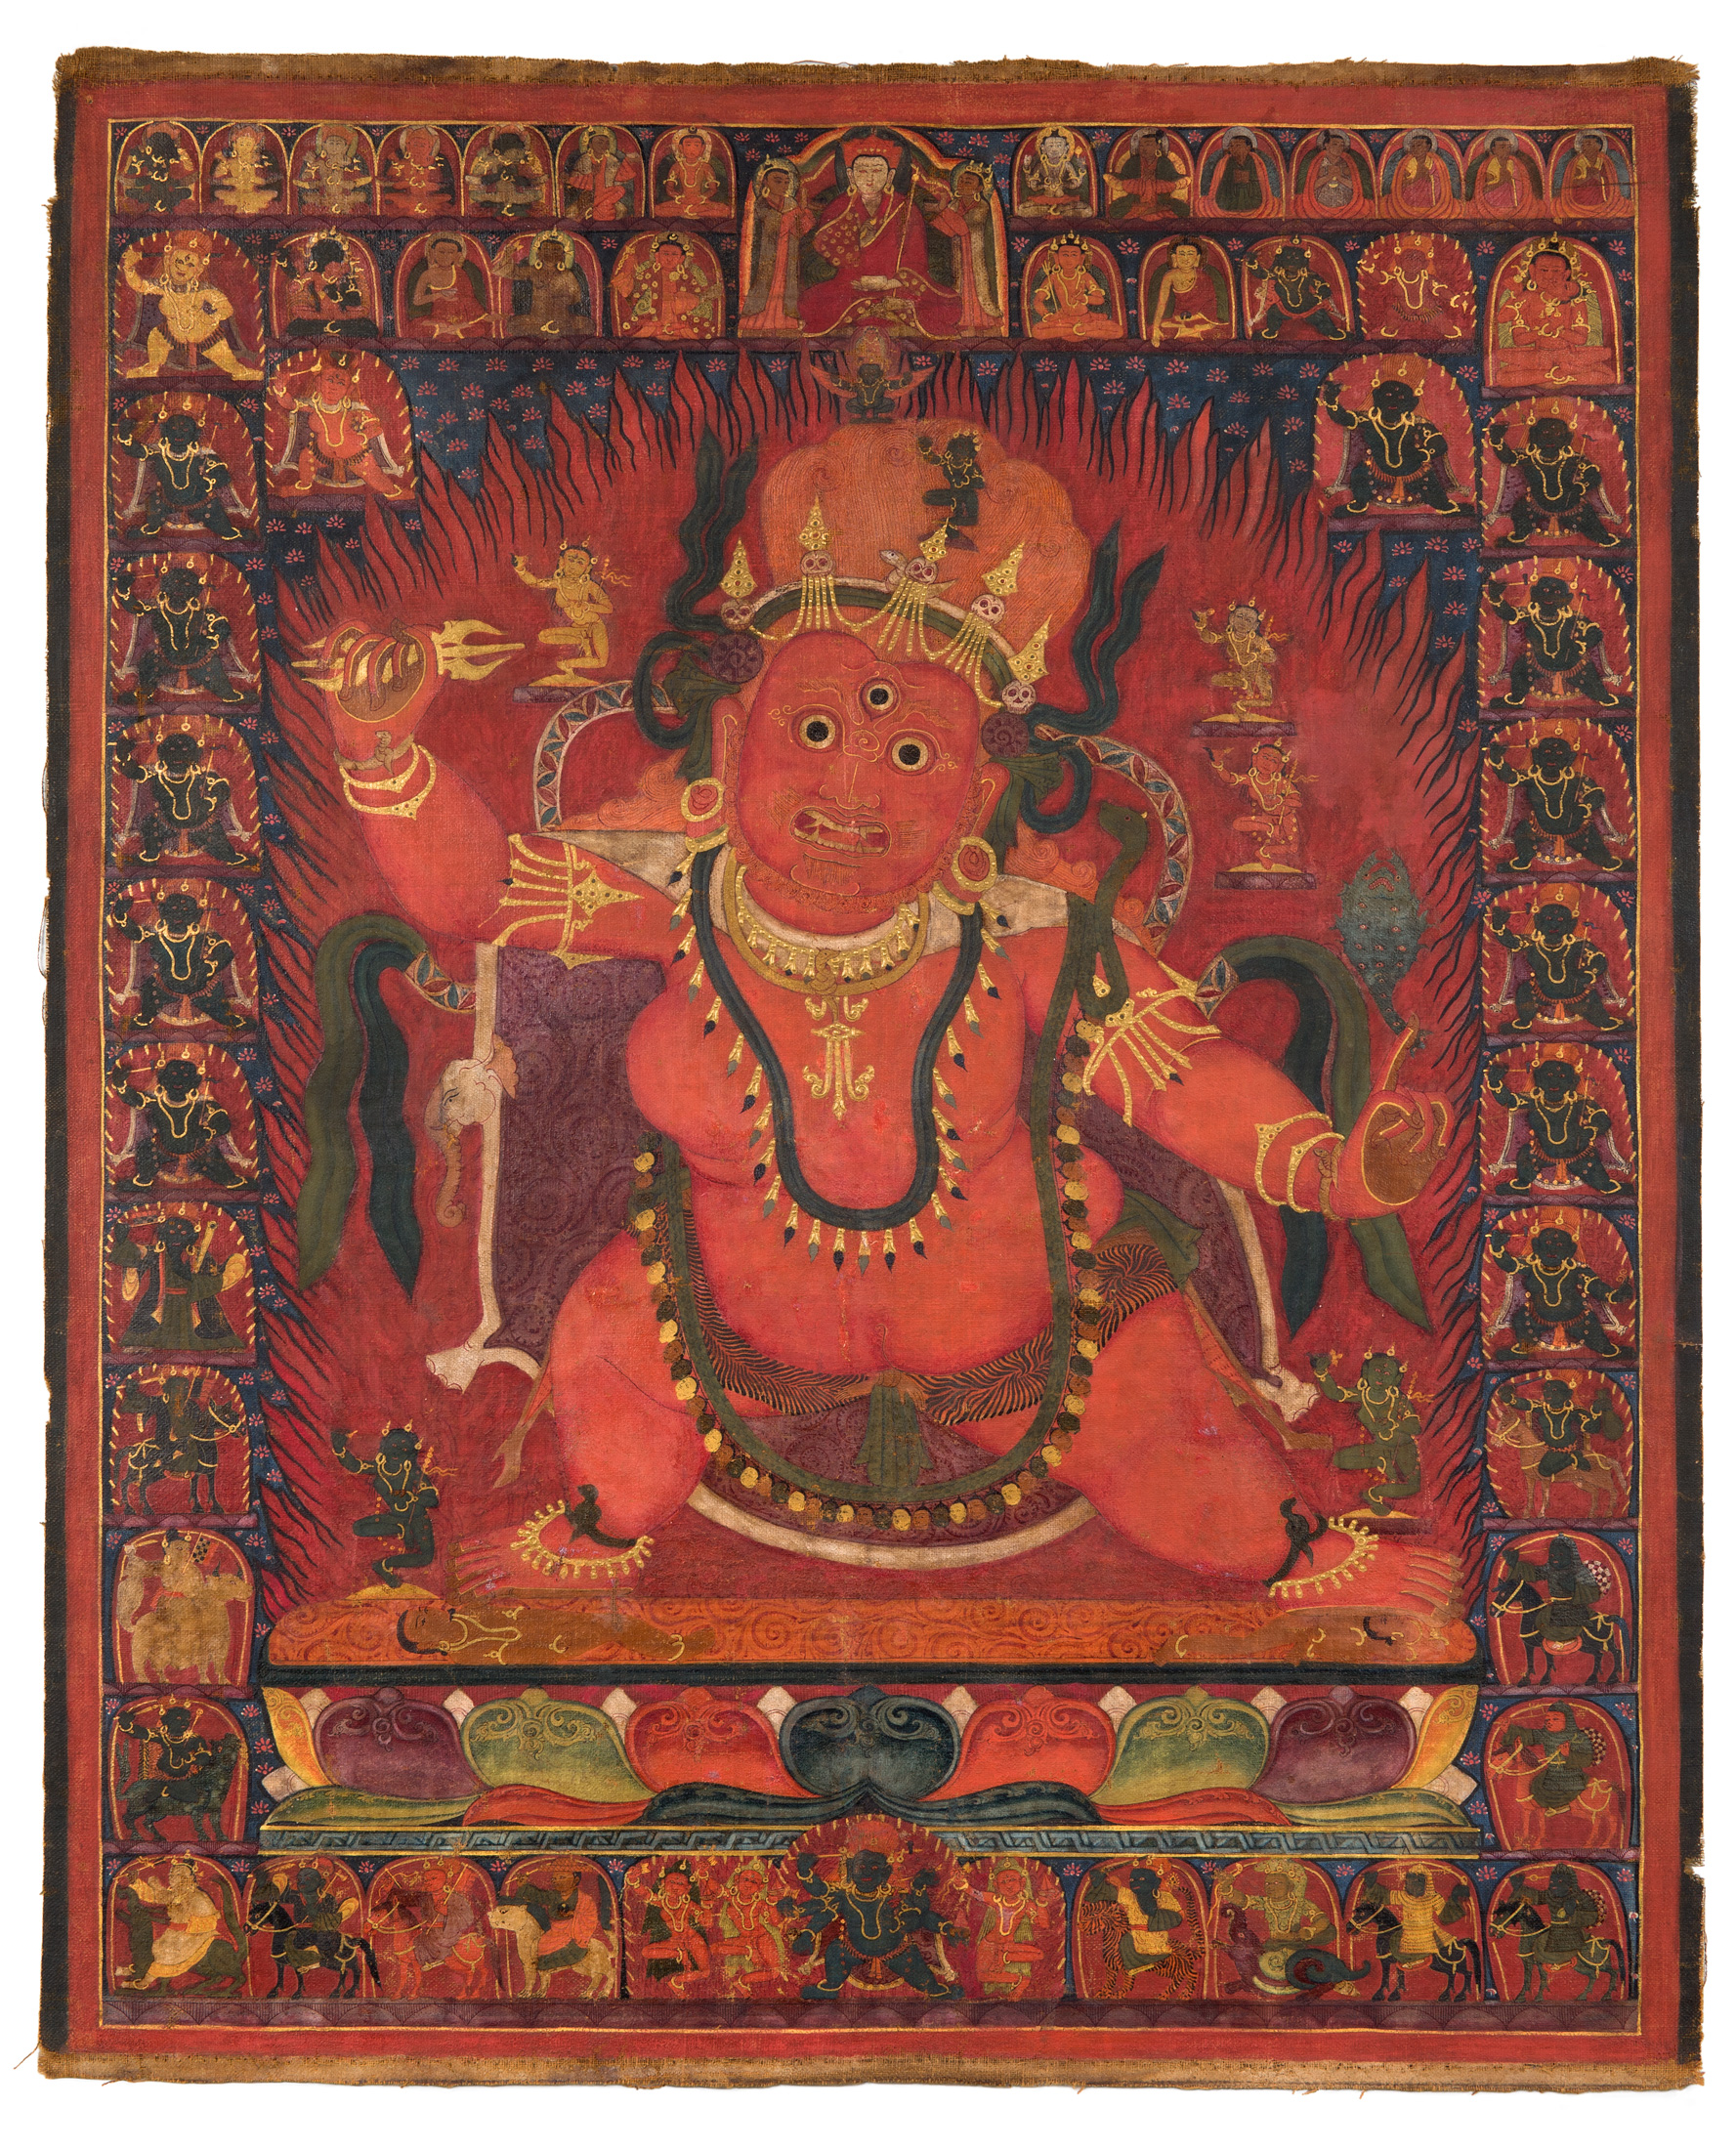 Padmasambhava as Guru Drakpo, Tibet, 15th century, pigment on cloth, 34 1/2 x 29 3/8 inches, image courtesy Rubin Museum of Art